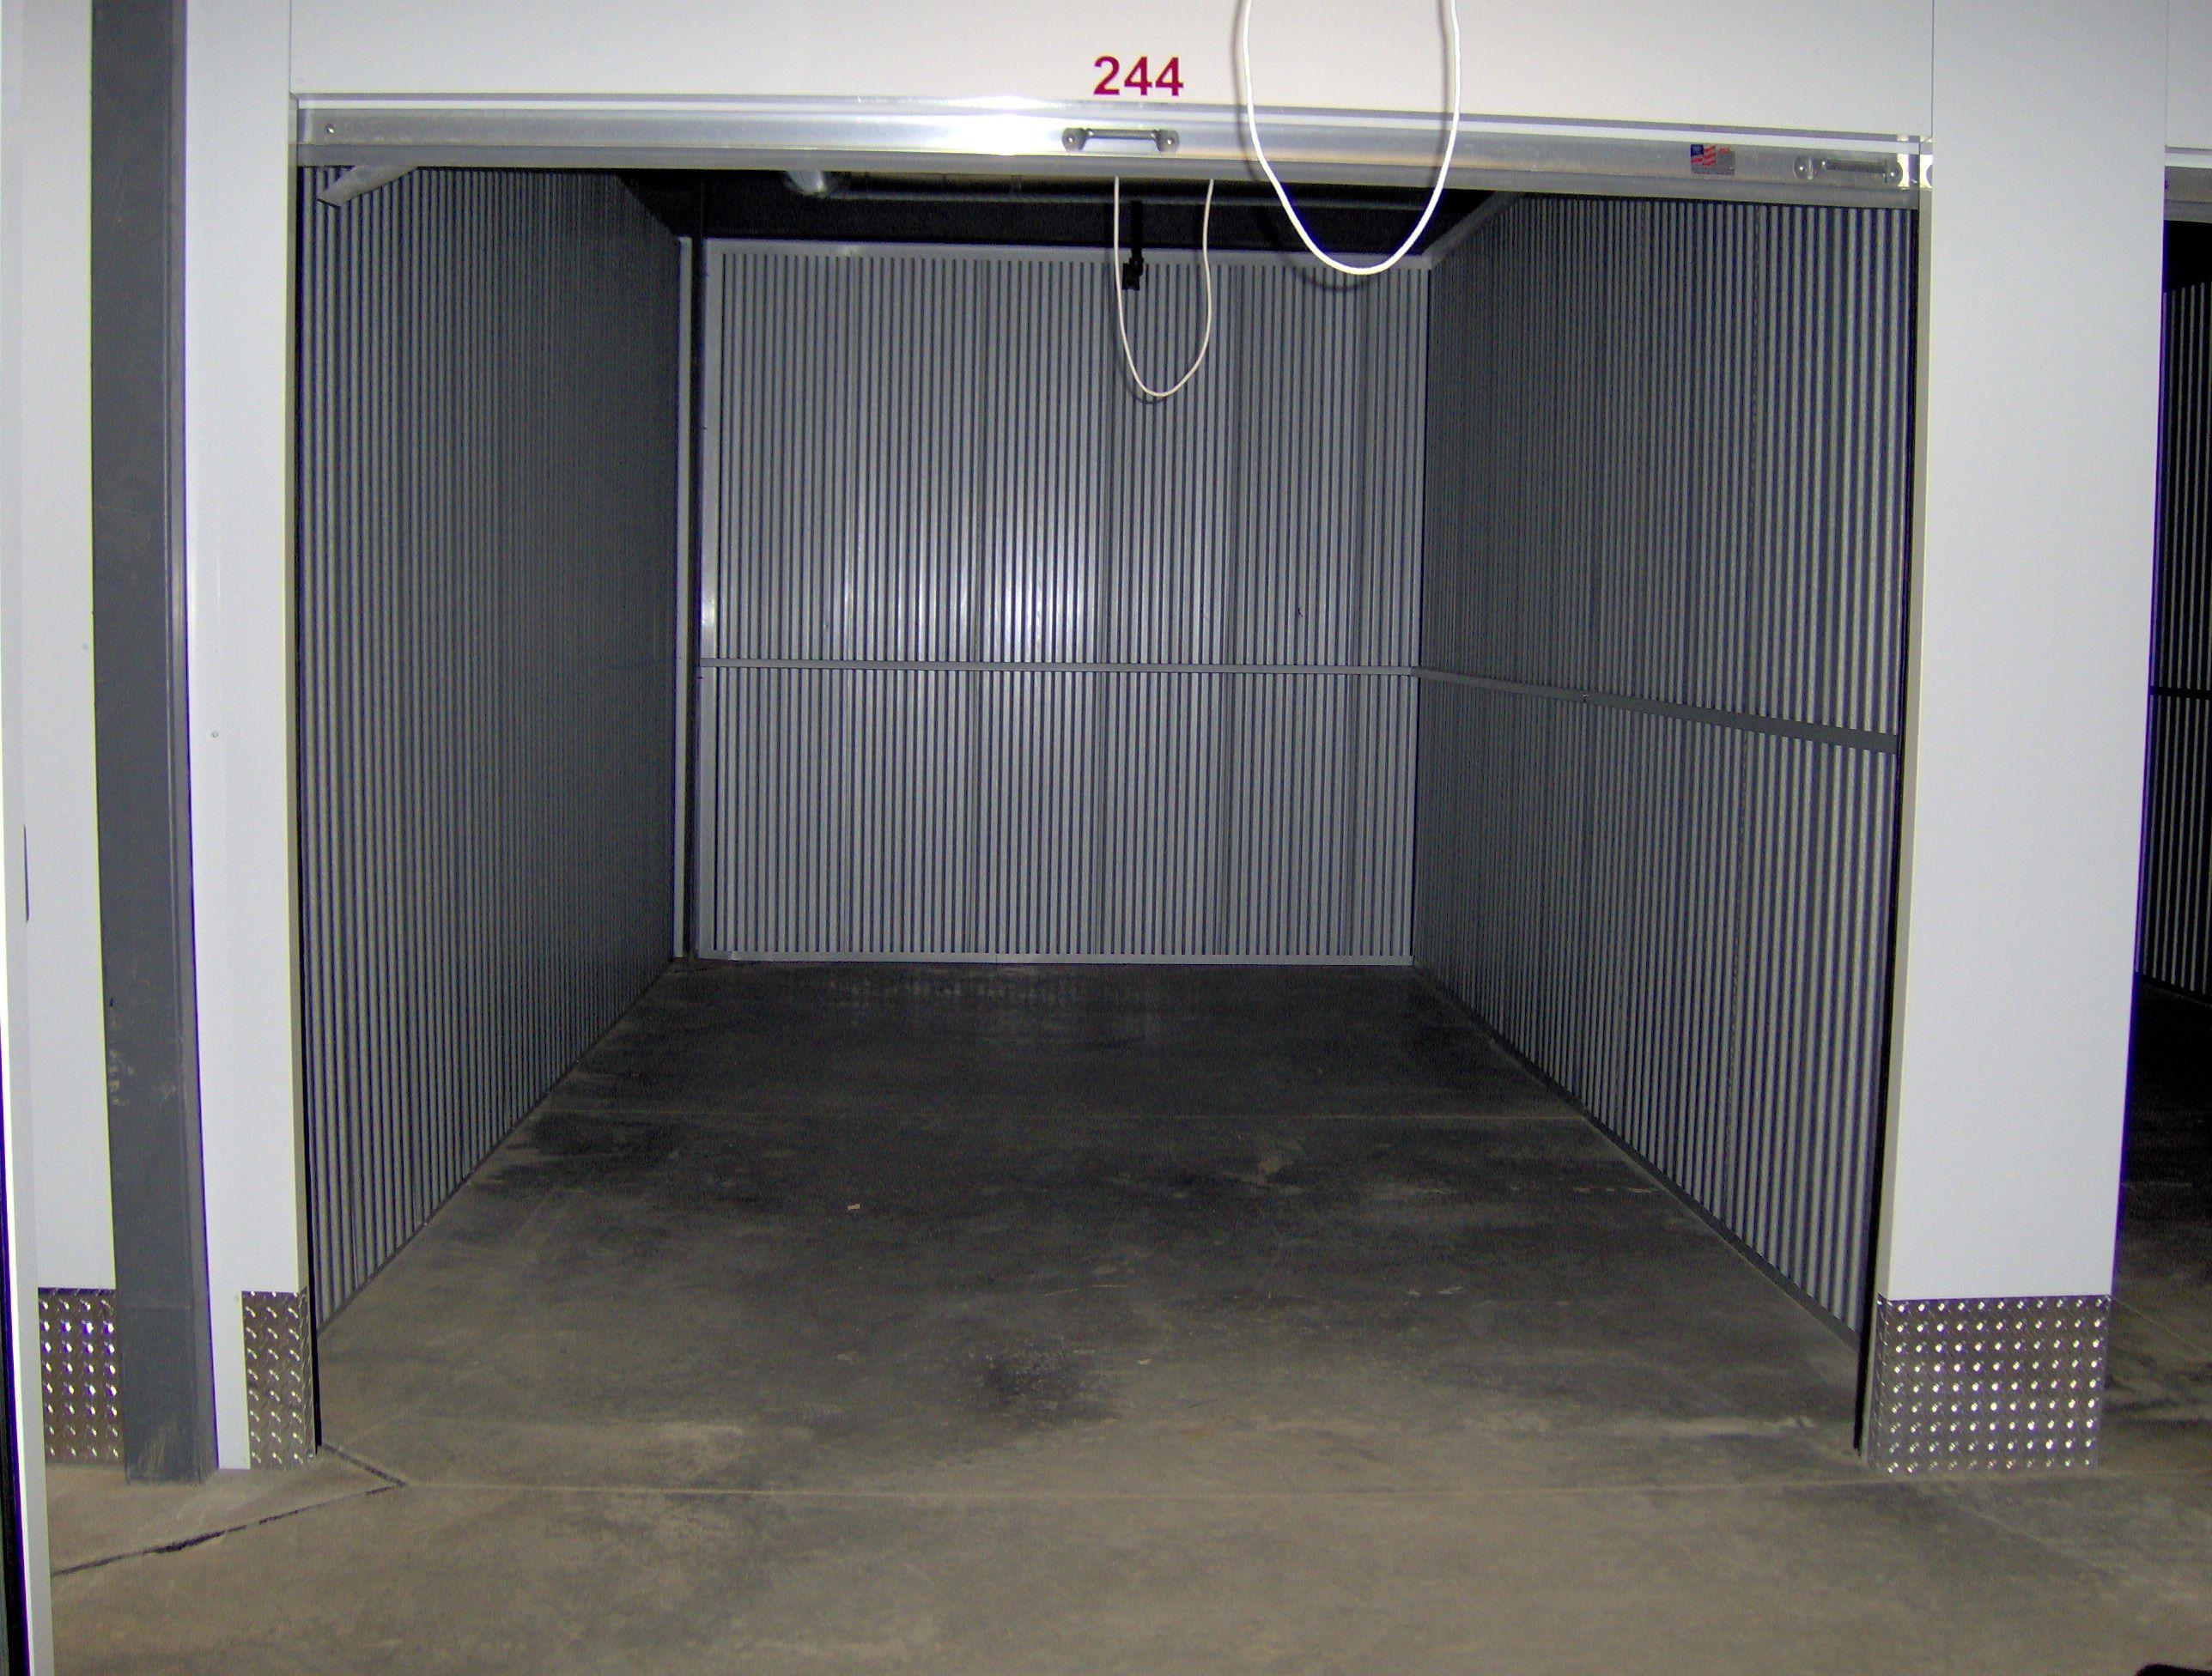 Our indoor storage units Indoor storage units, Personal